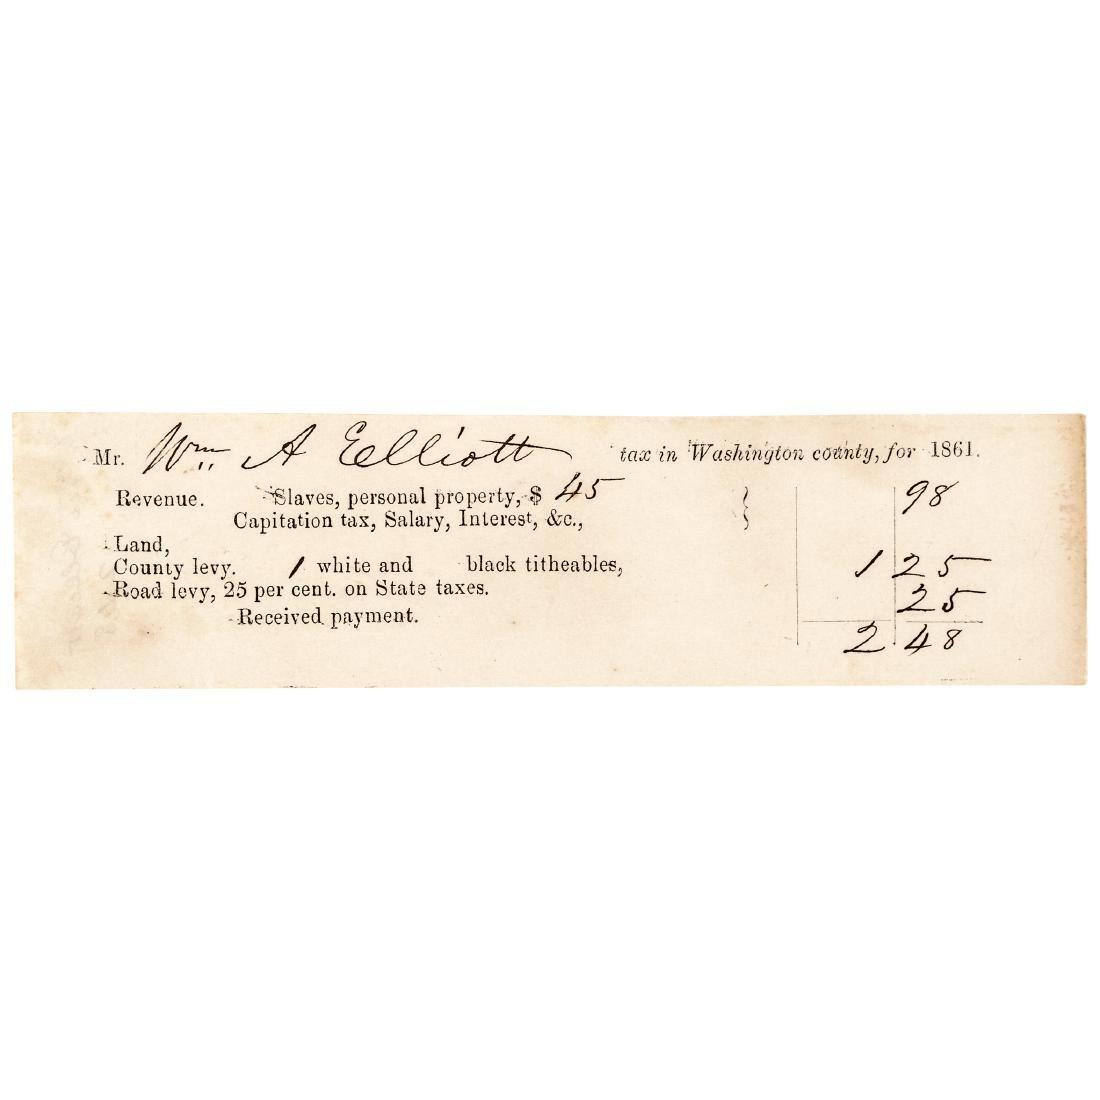 1861 Civil War Tax Receipt for Slaves + Property